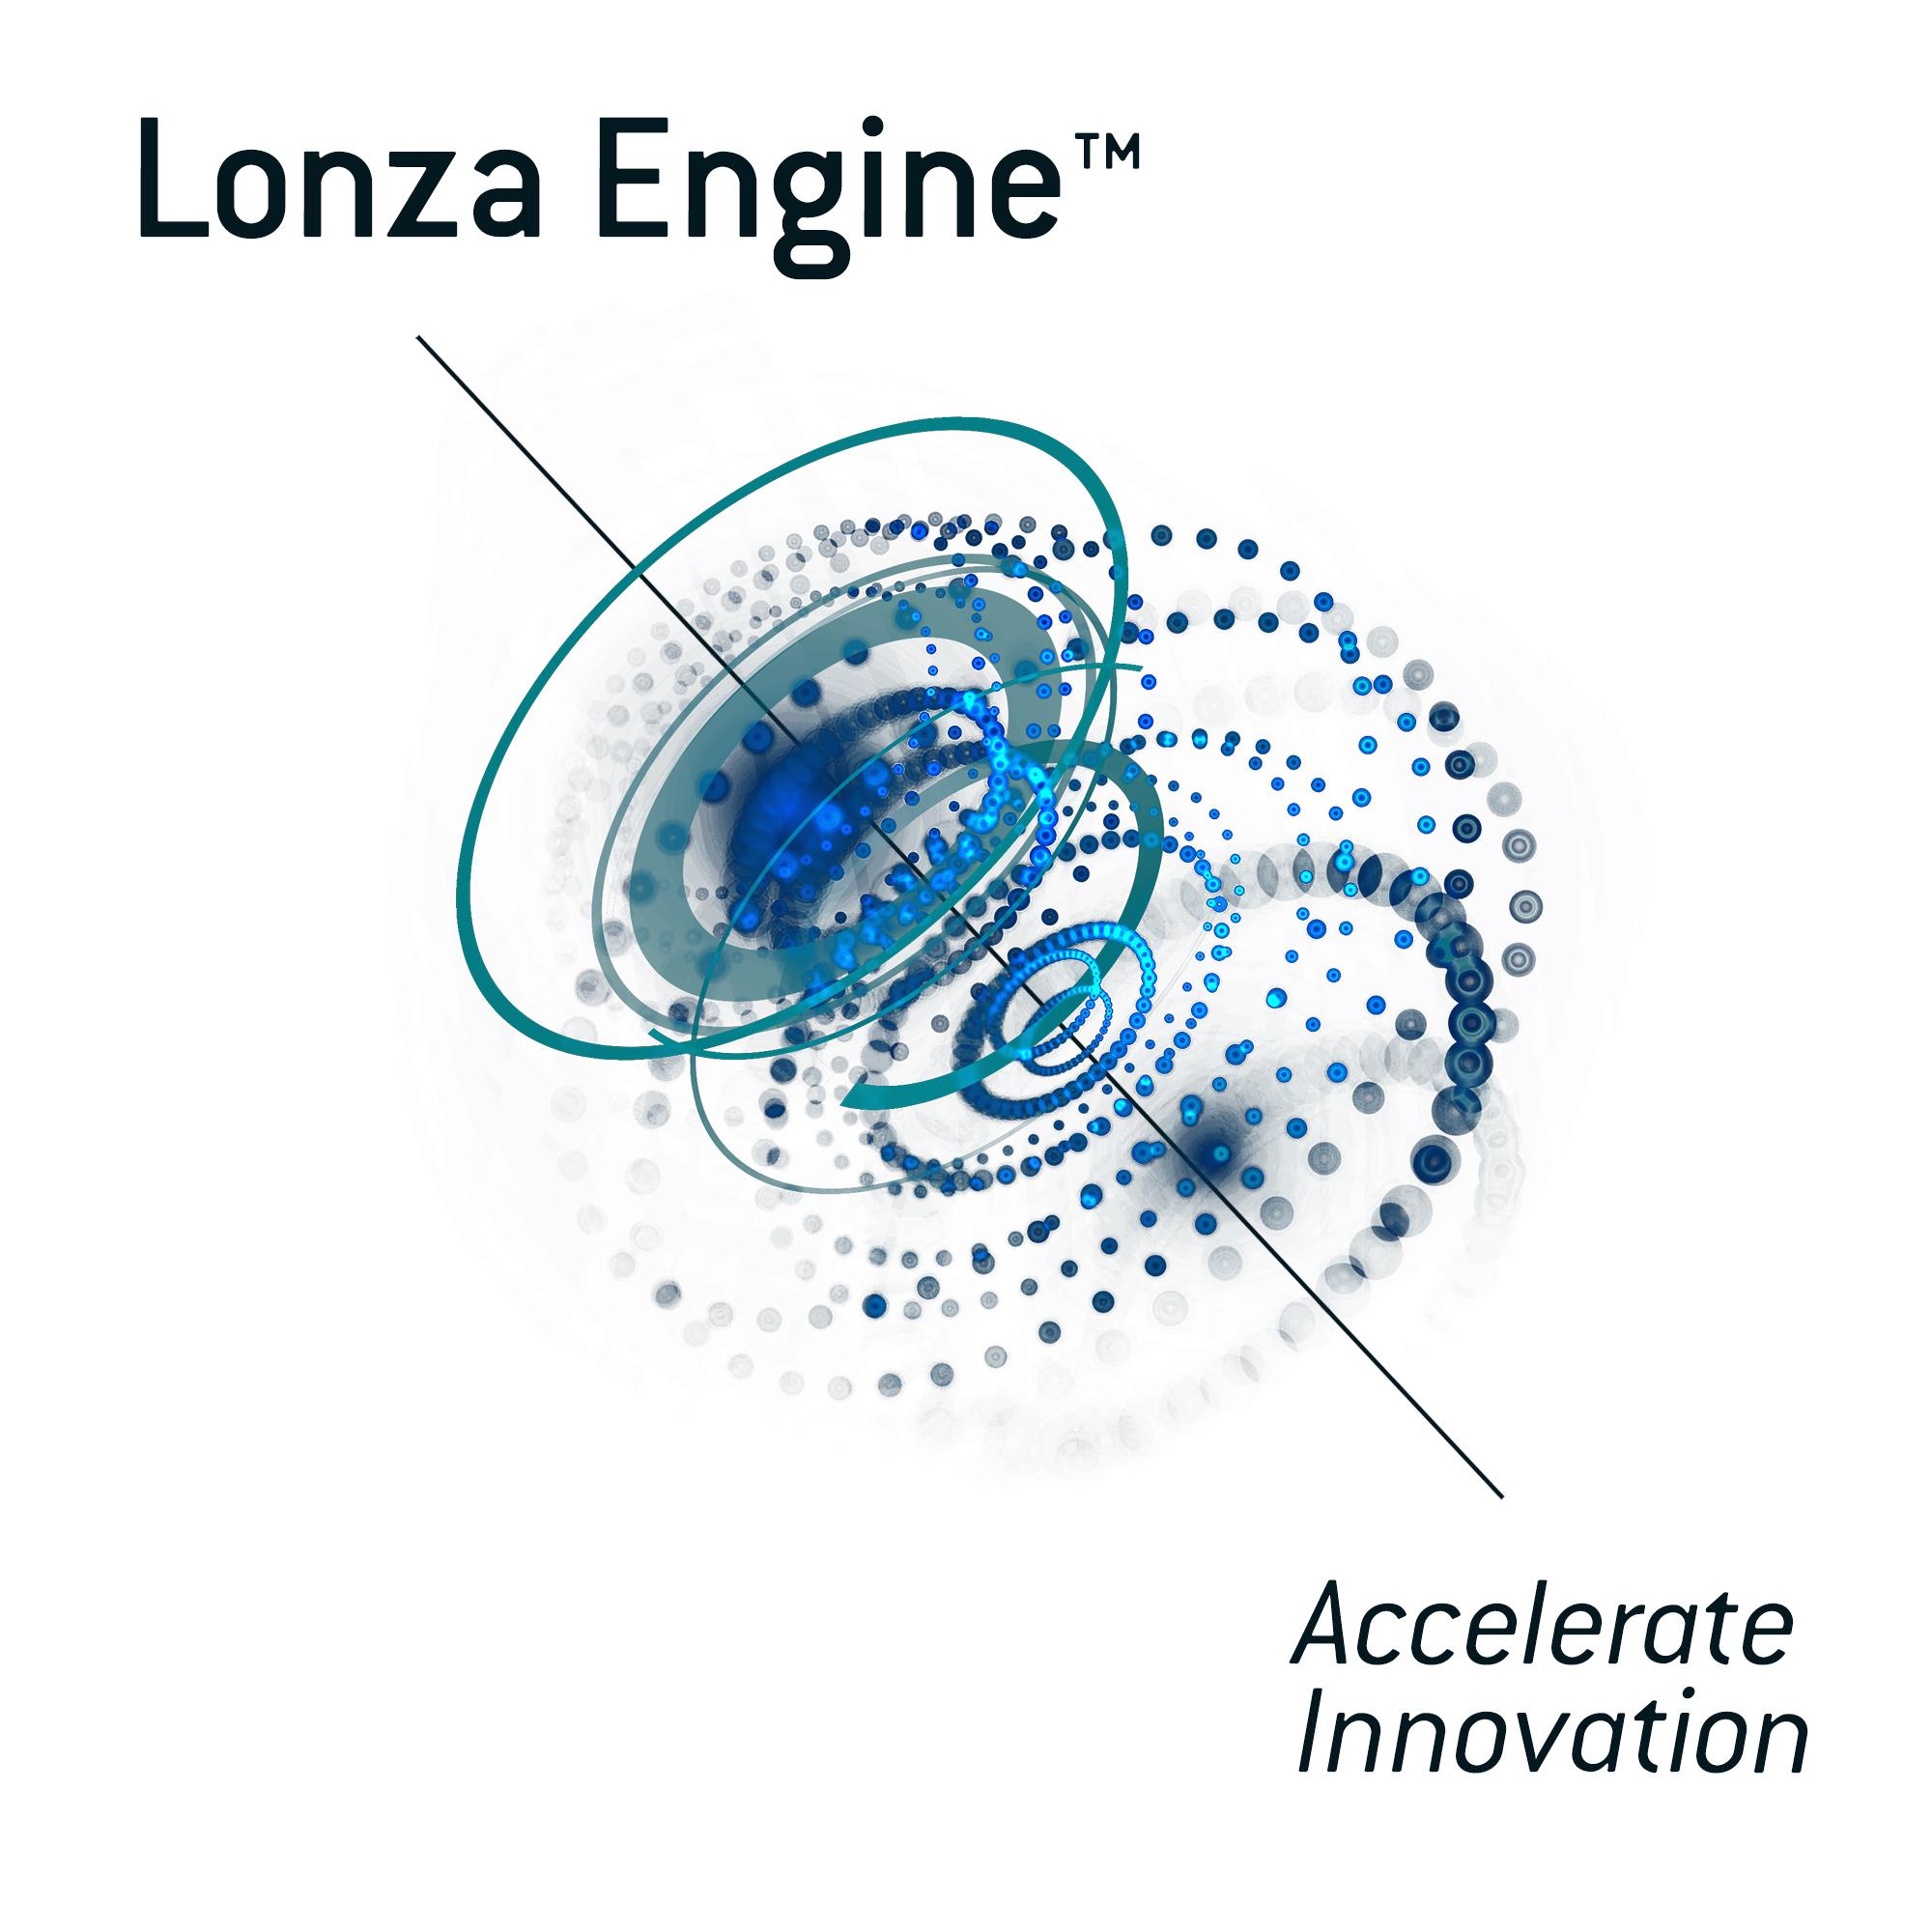 Lonza Engine equipment